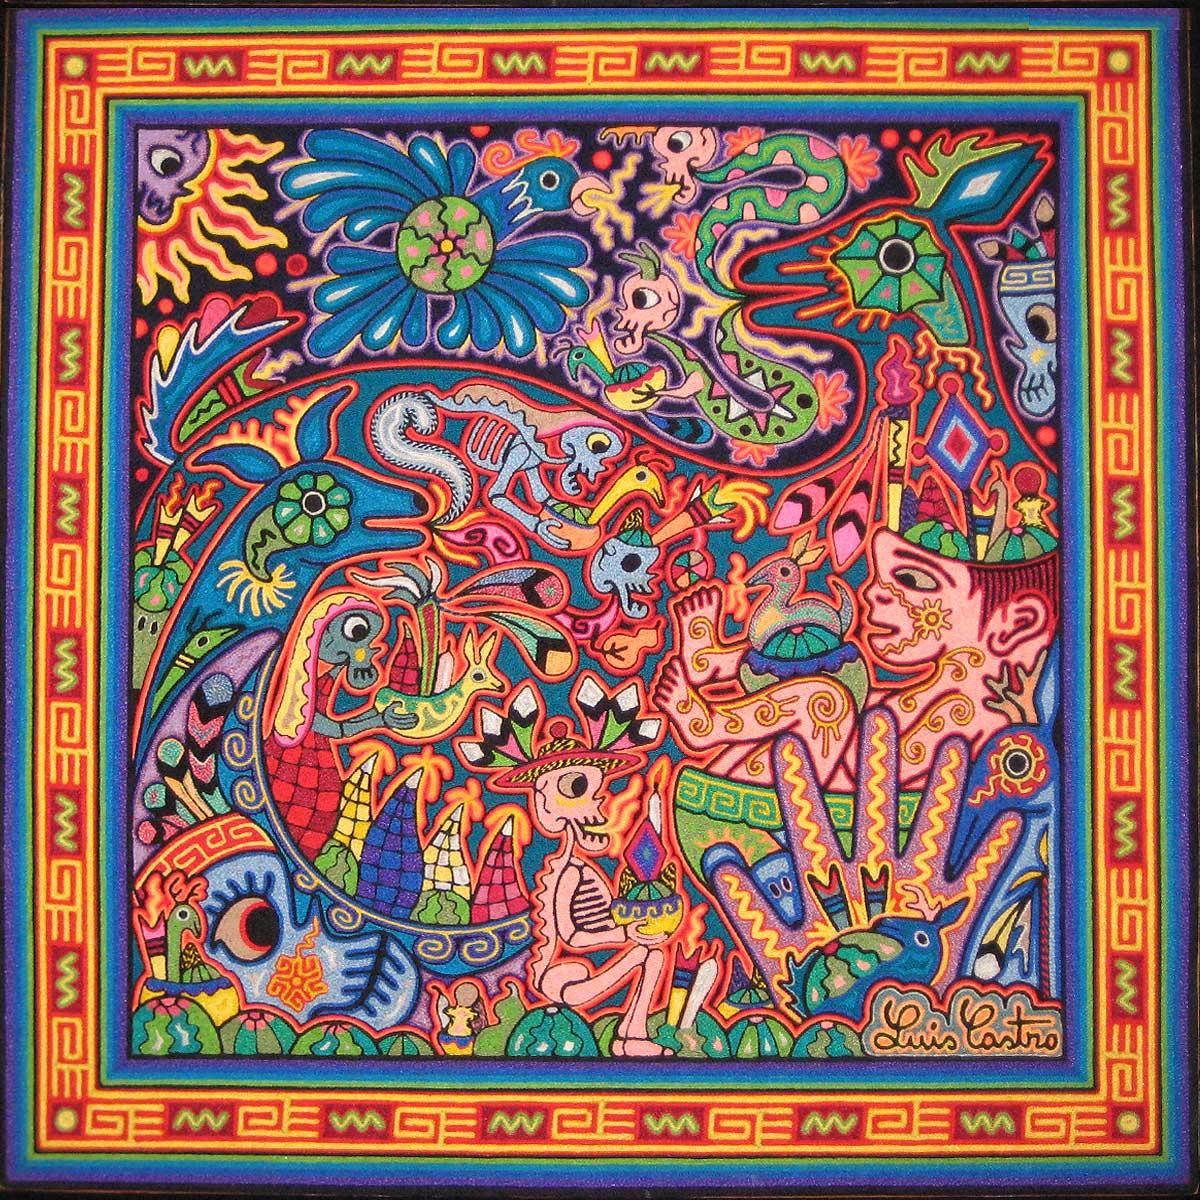 Luis Castro Premier Huichol Yarn Painting 24 x24